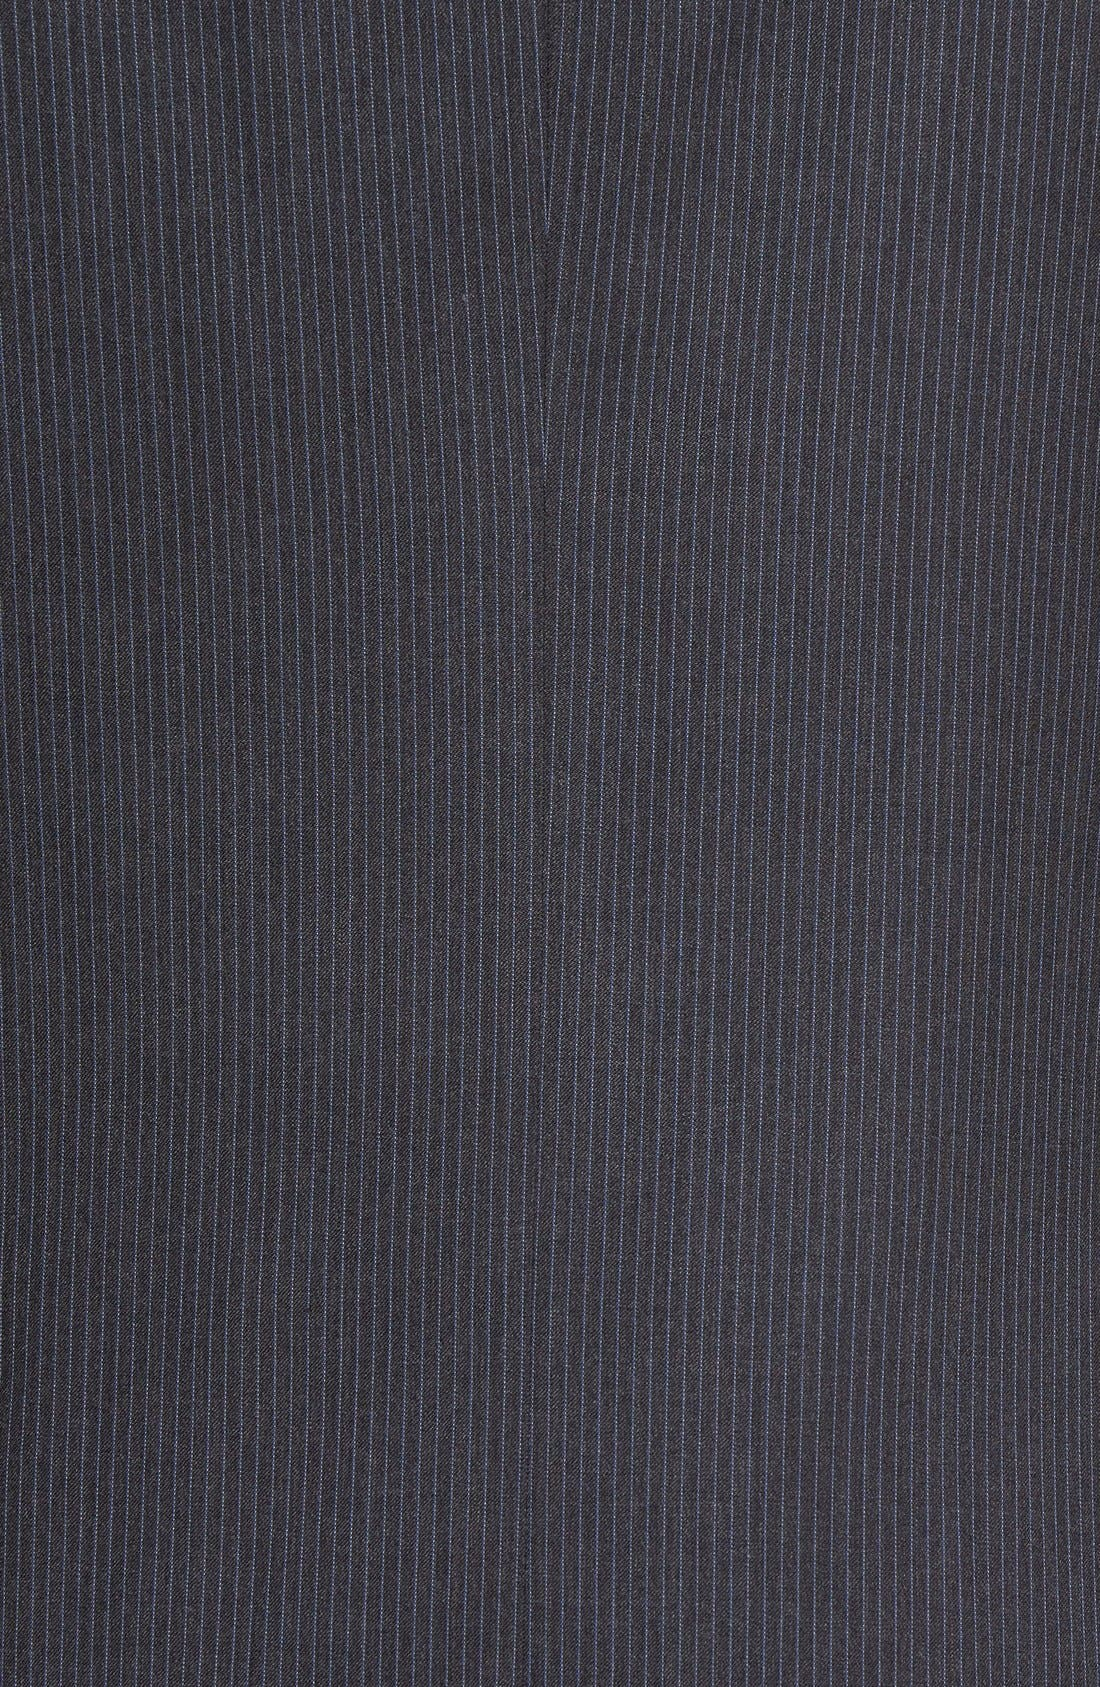 Trim Fit Stripe Wool Suit,                             Alternate thumbnail 7, color,                             Dark Grey